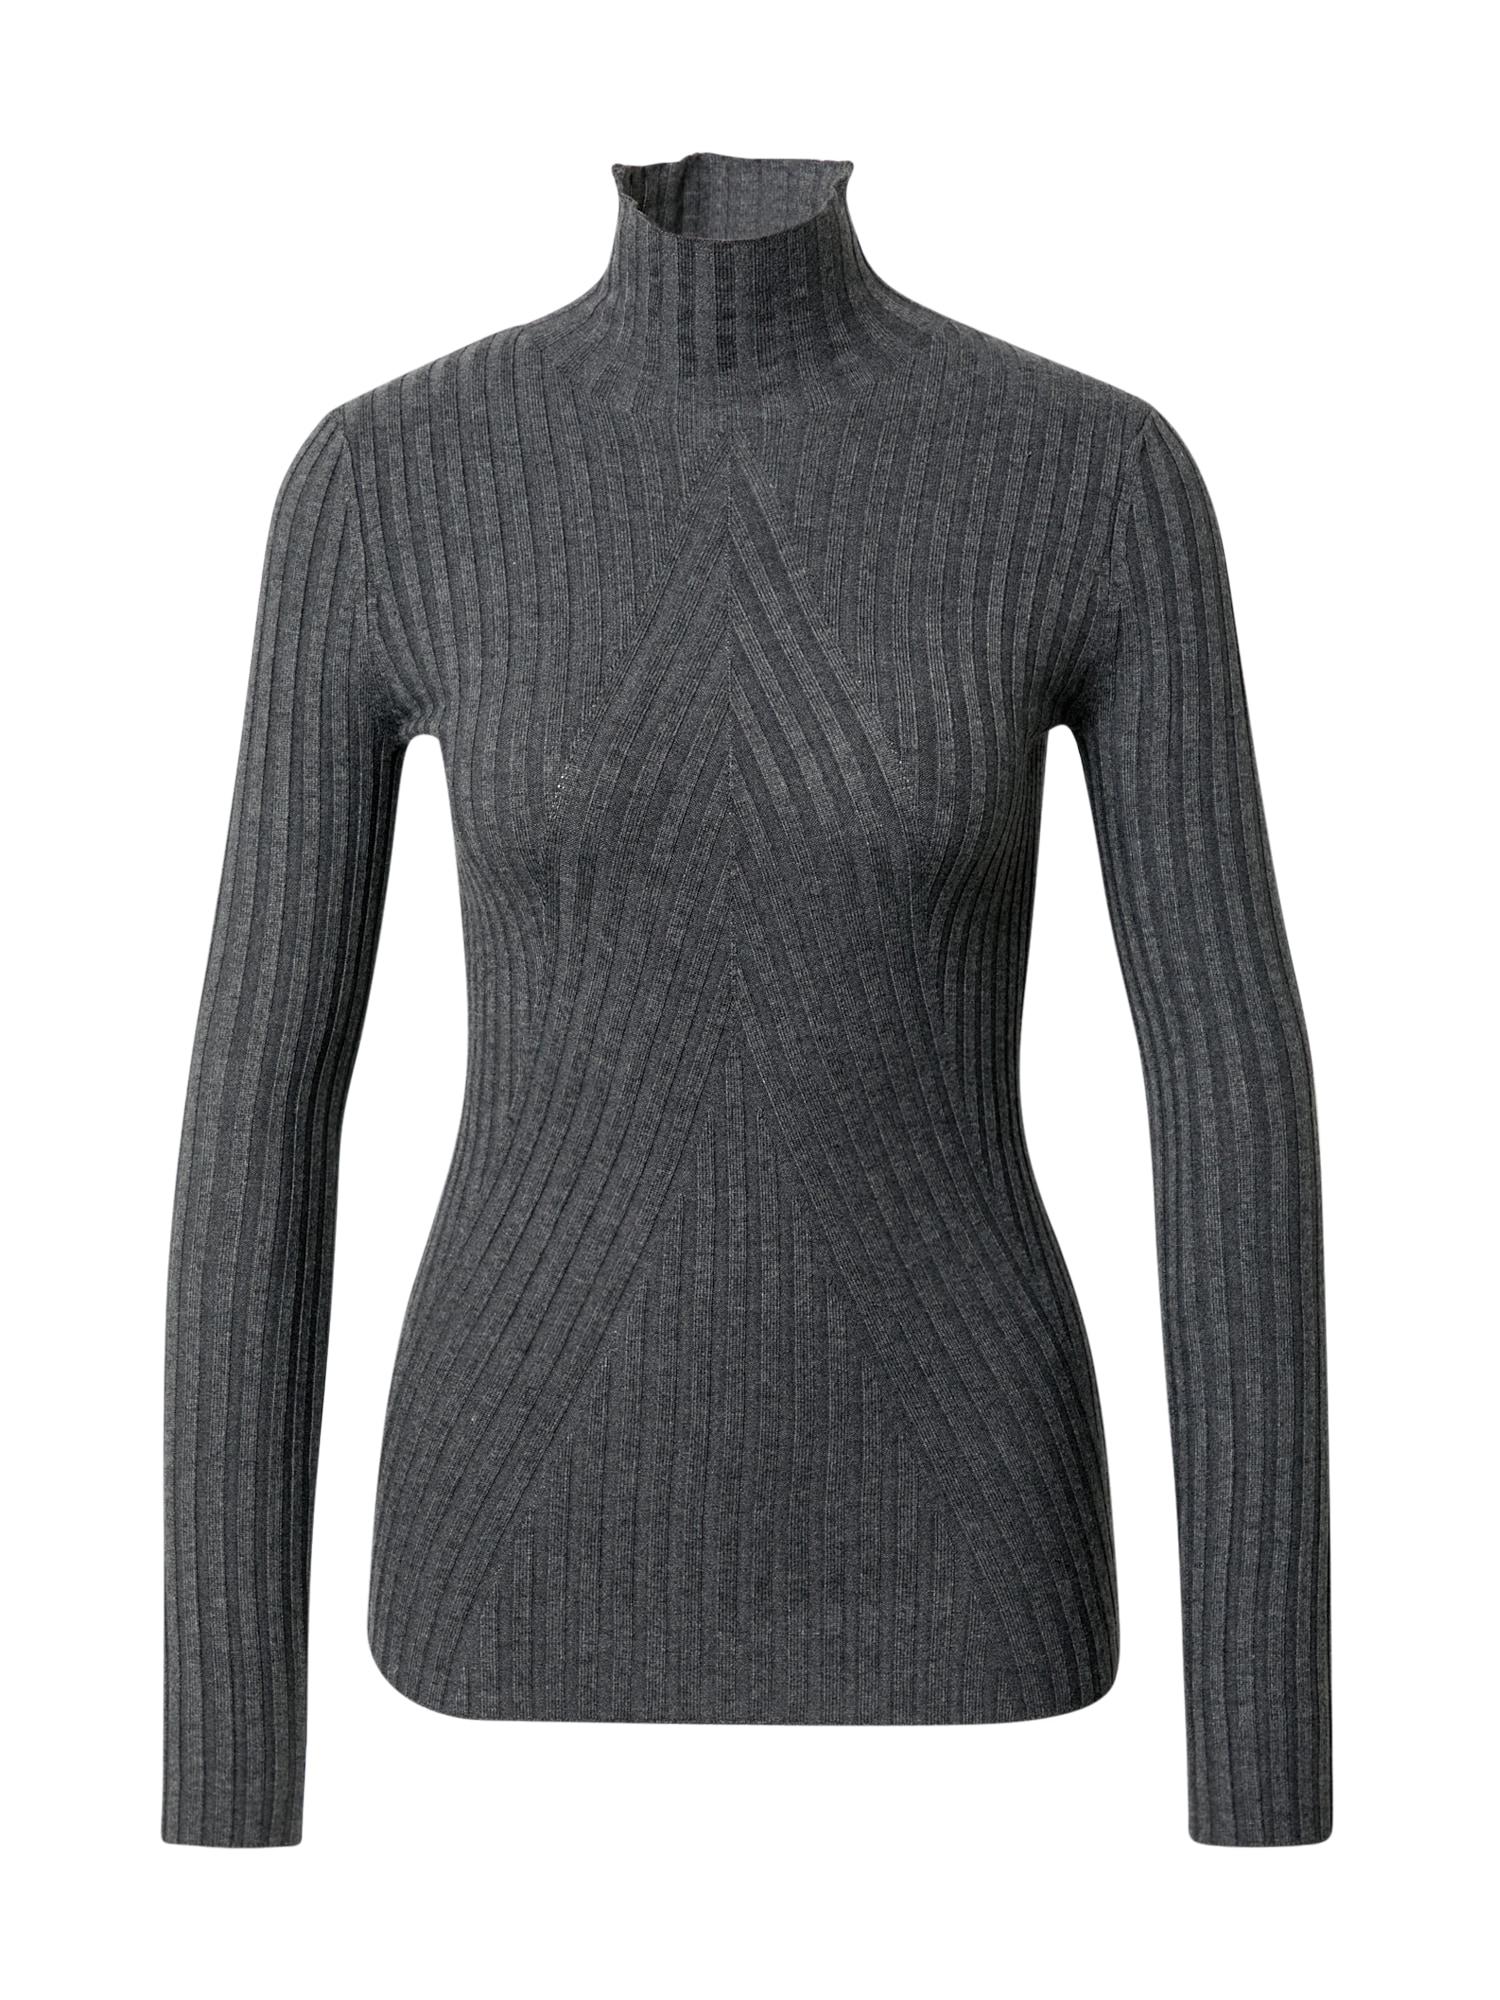 NORR Megztinis margai pilka